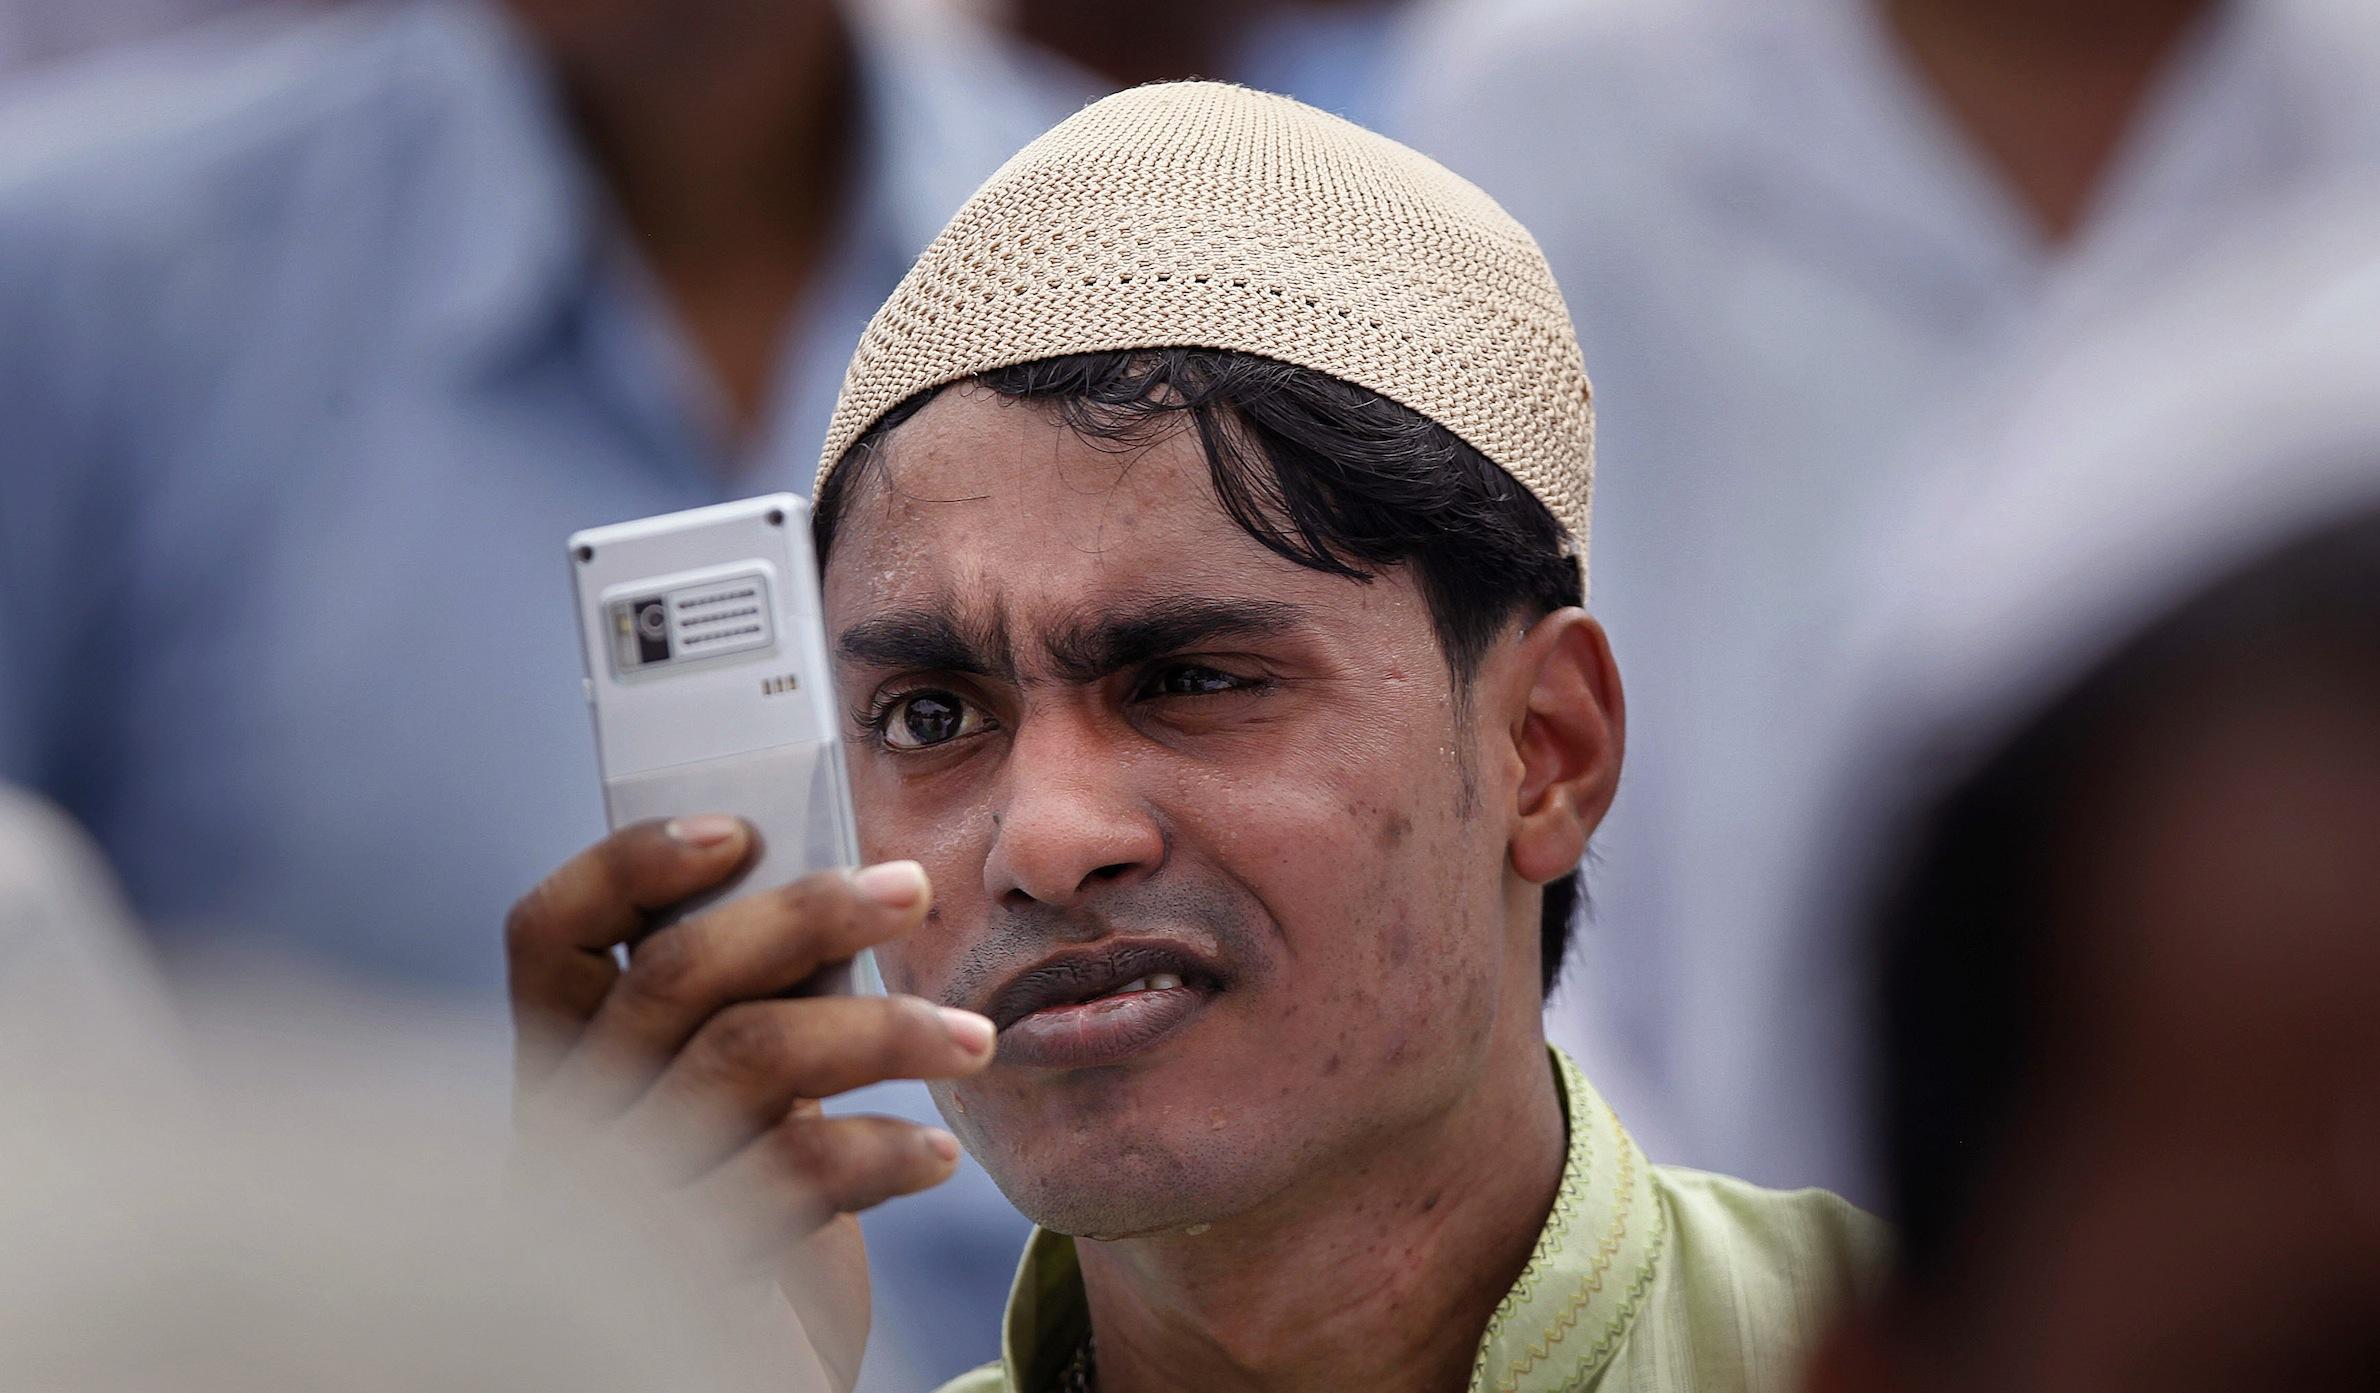 Indian man on phone